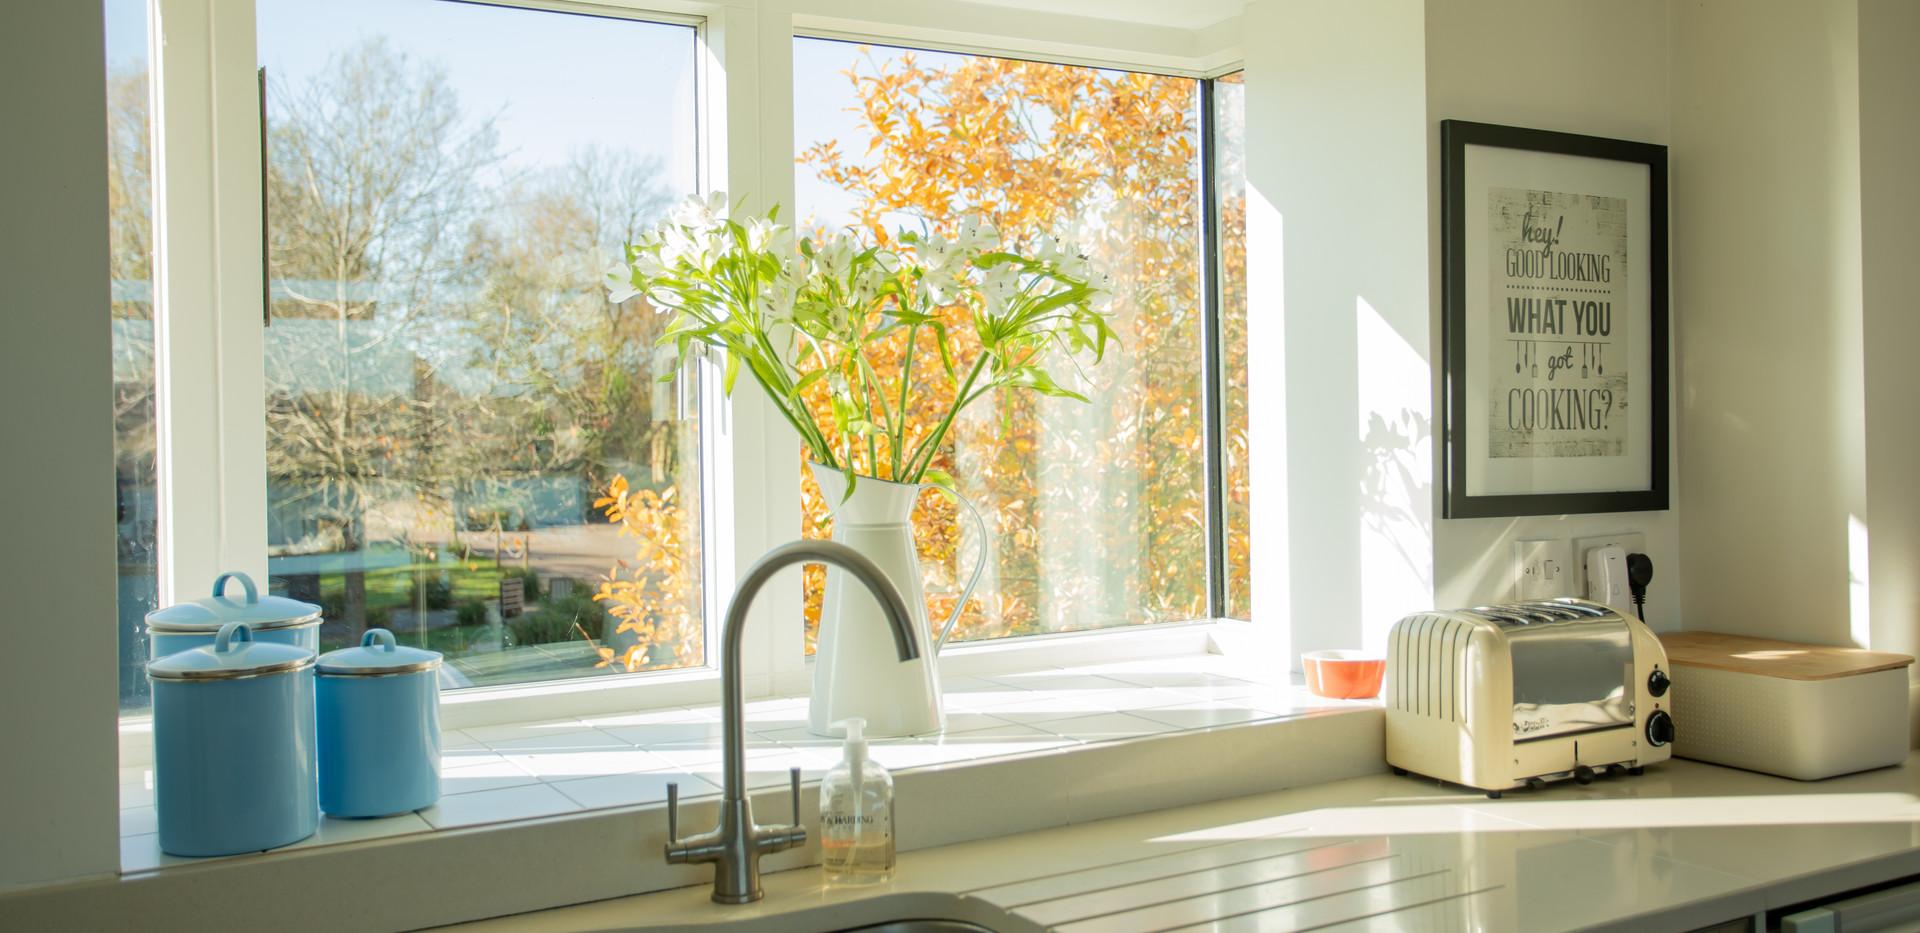 Sandpipers kitchen window